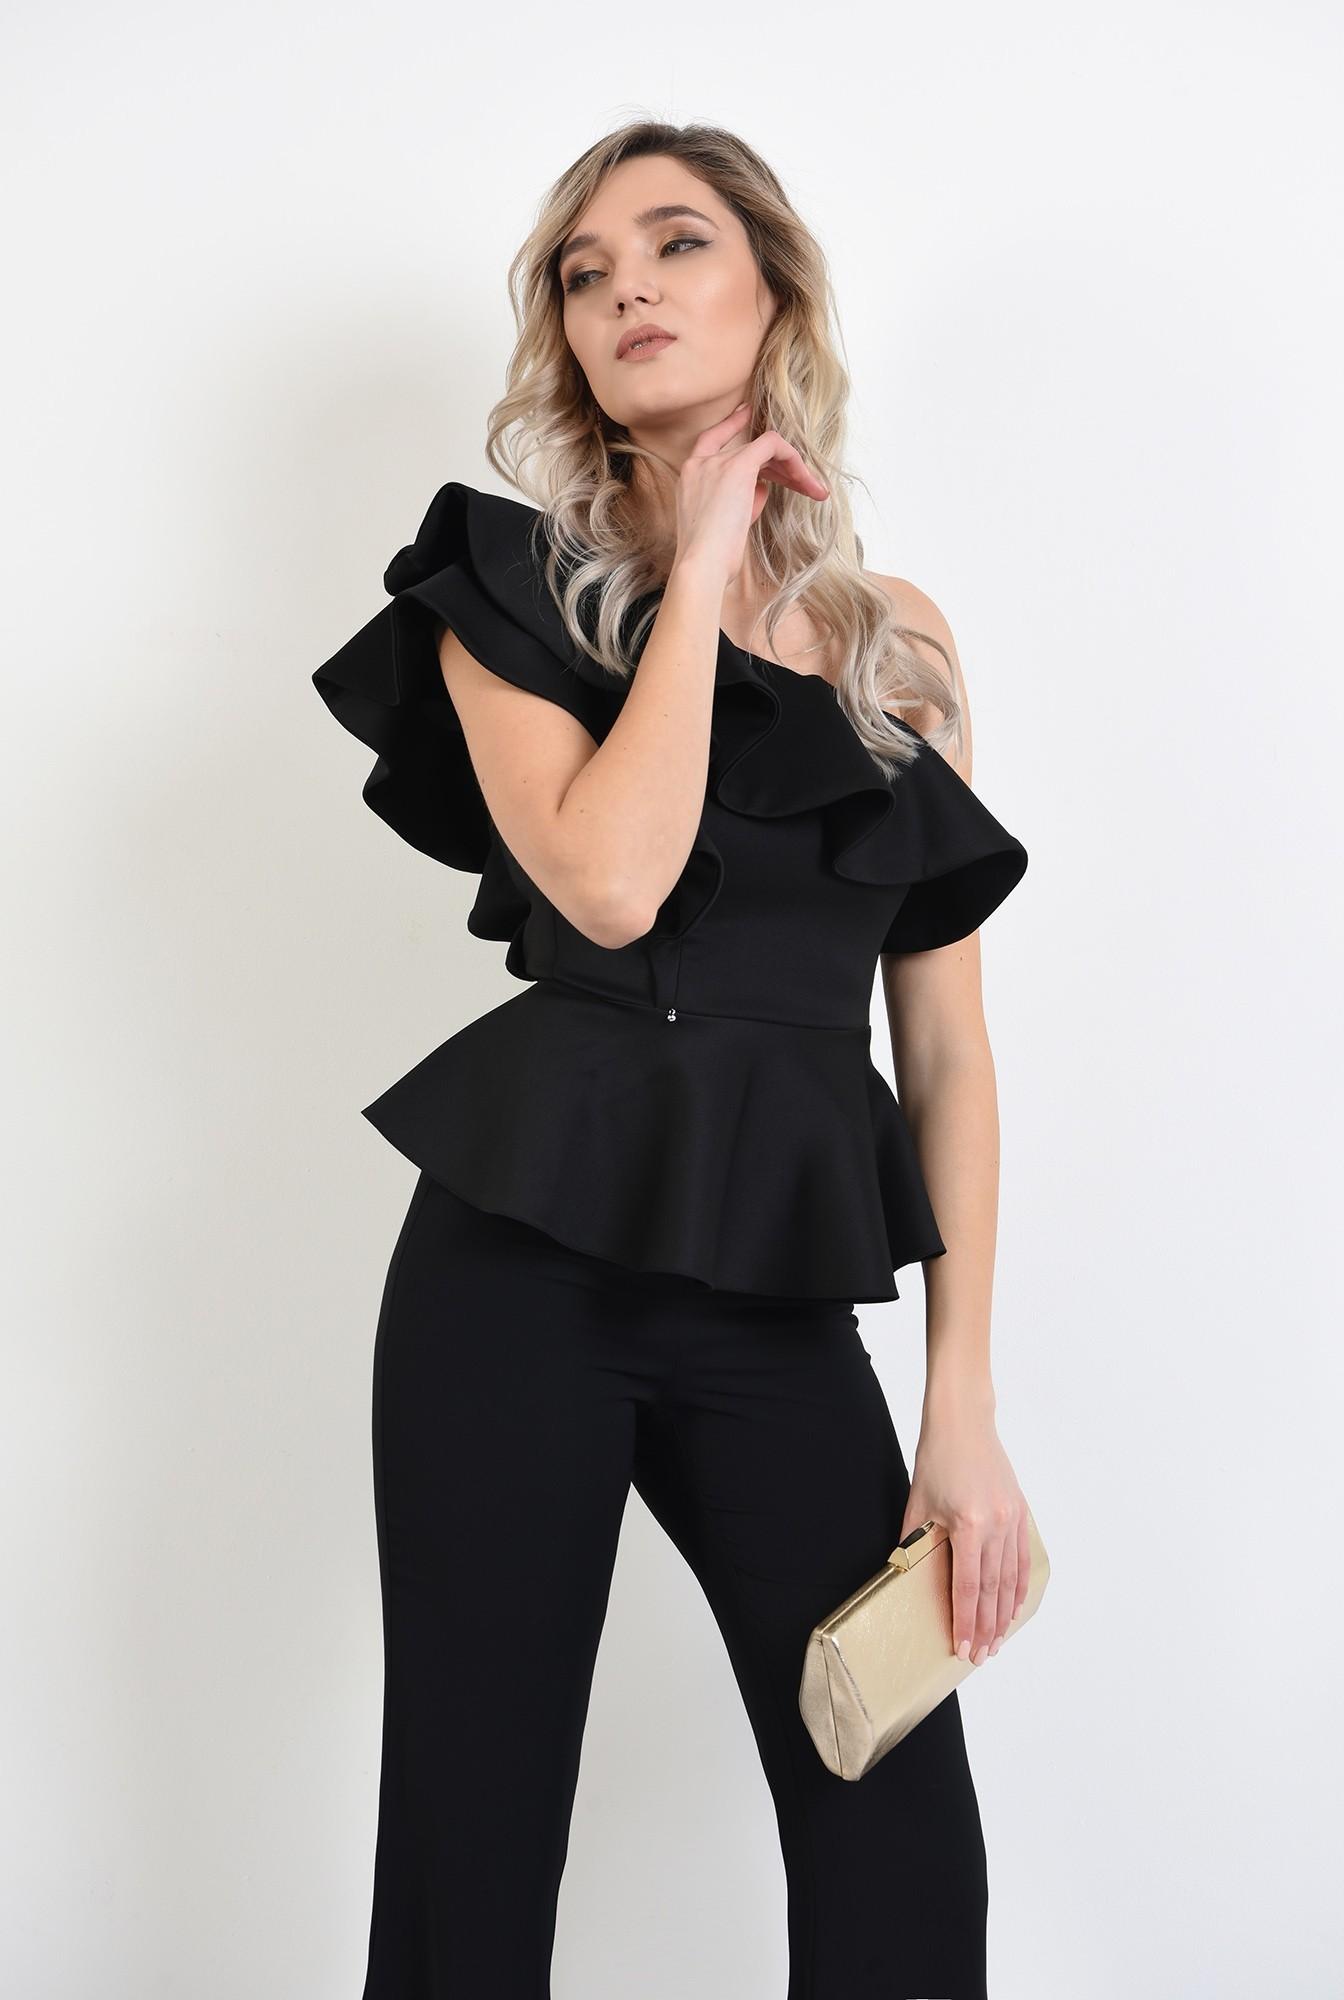 0 - 360 - bluza eleganta, neagra, cu volane, cu peplum, bluza de ocazie